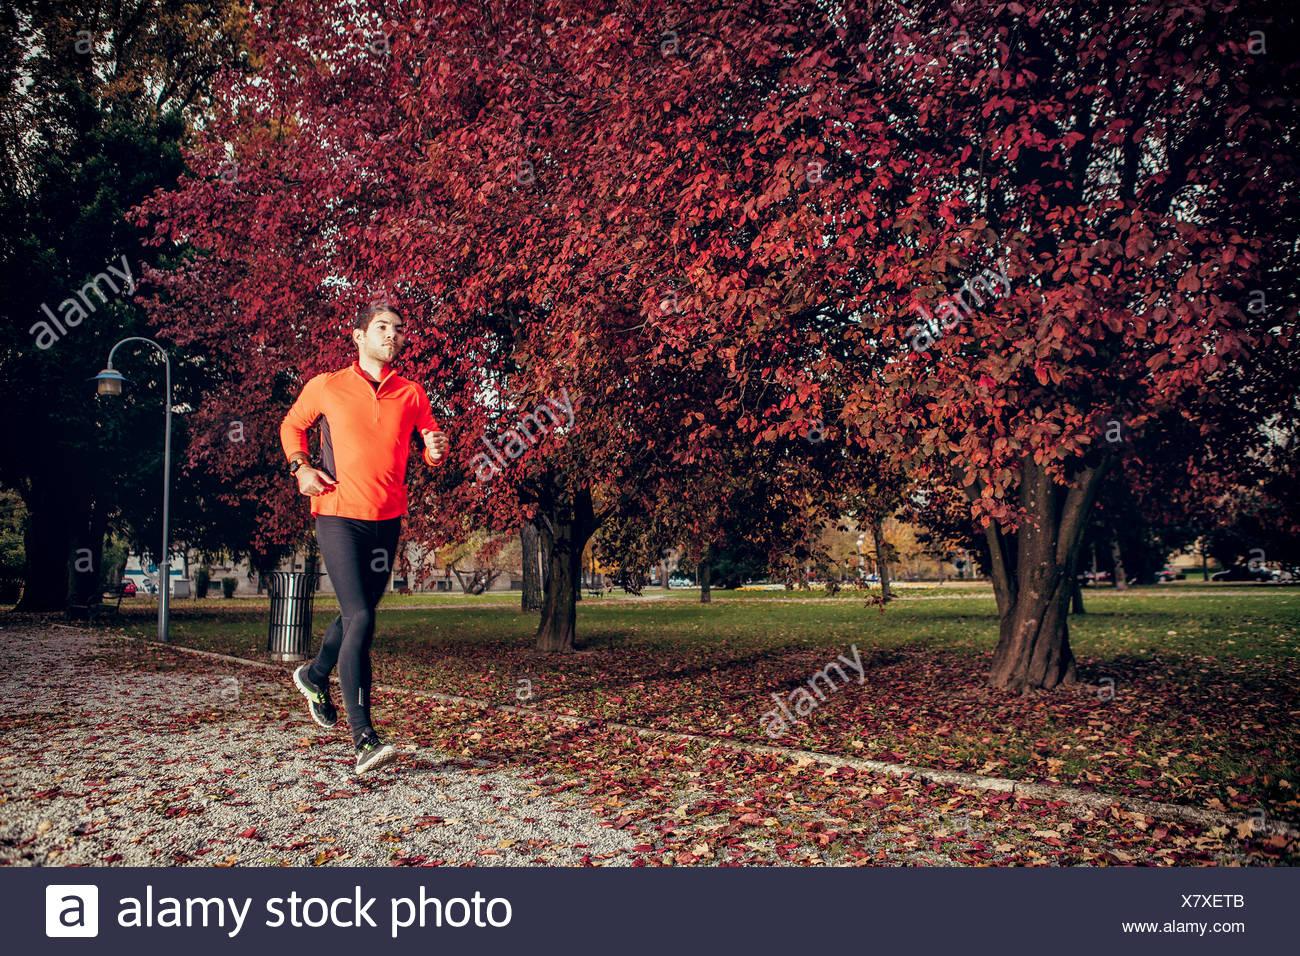 Male runner jogging in autumn park - Stock Image